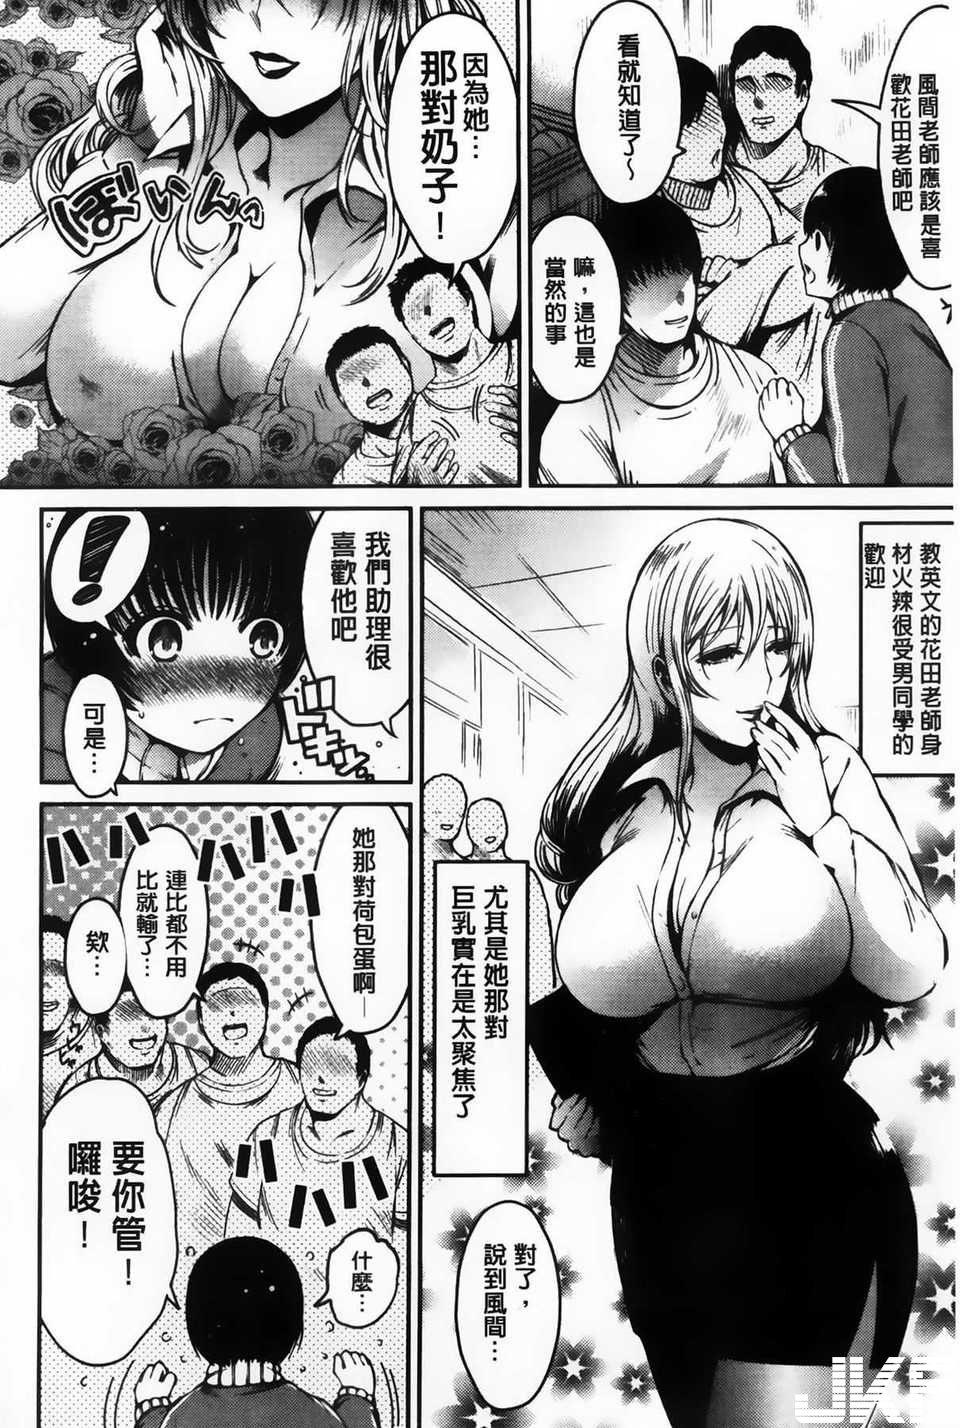 AoJiaoZero_064.jpg